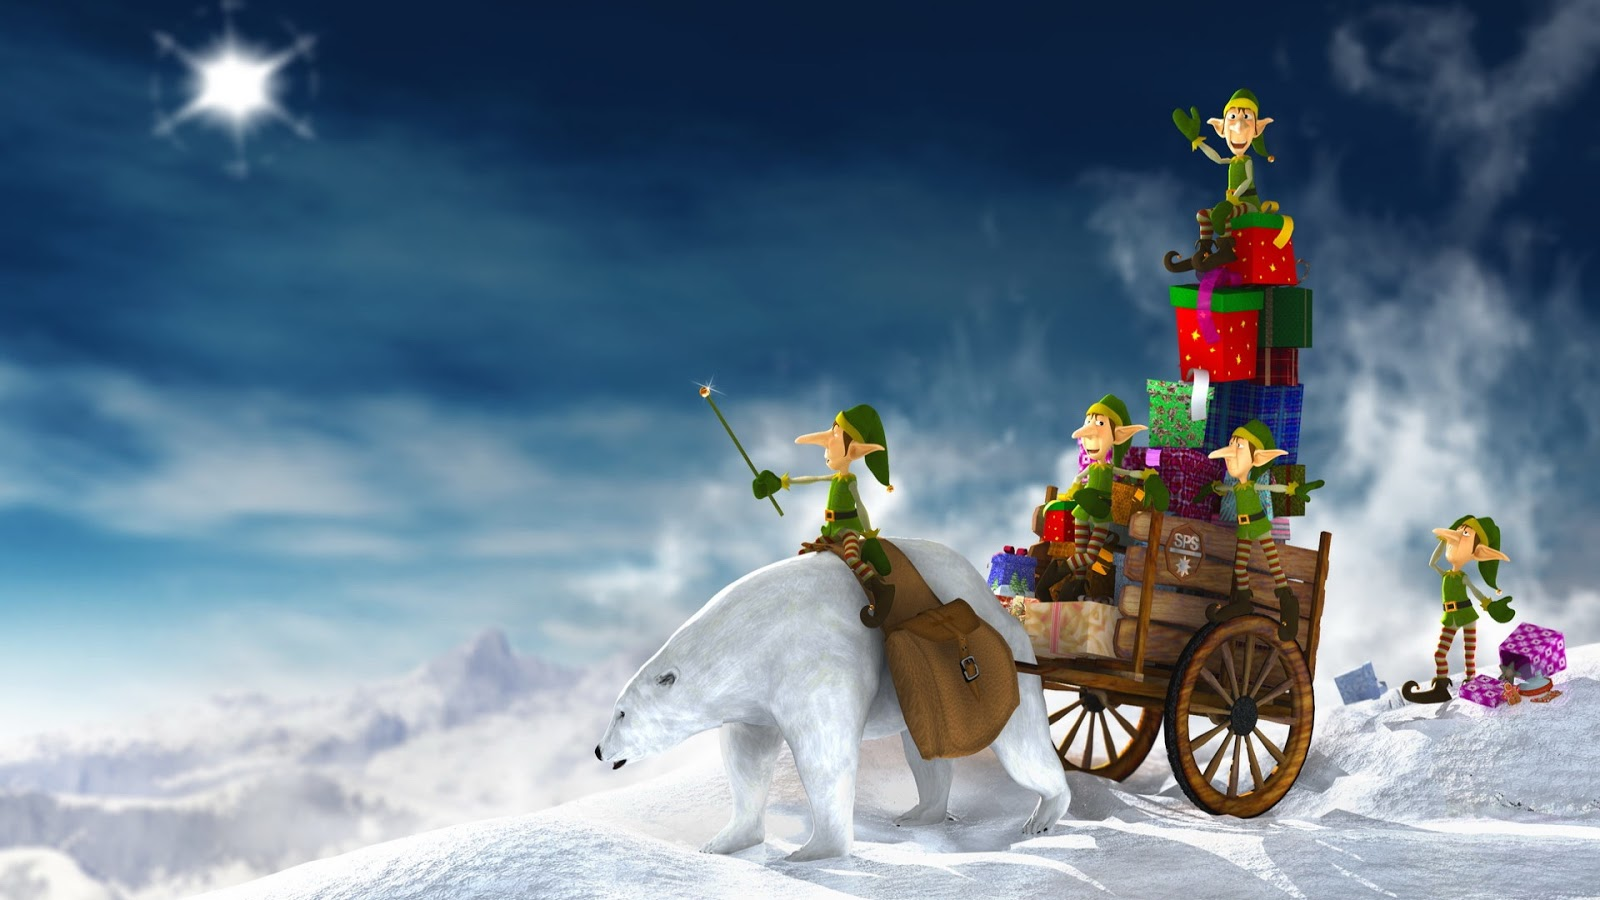 Christmas Wallpapers Hd 1080p: Christmas Full HD Wallpapers 1080p